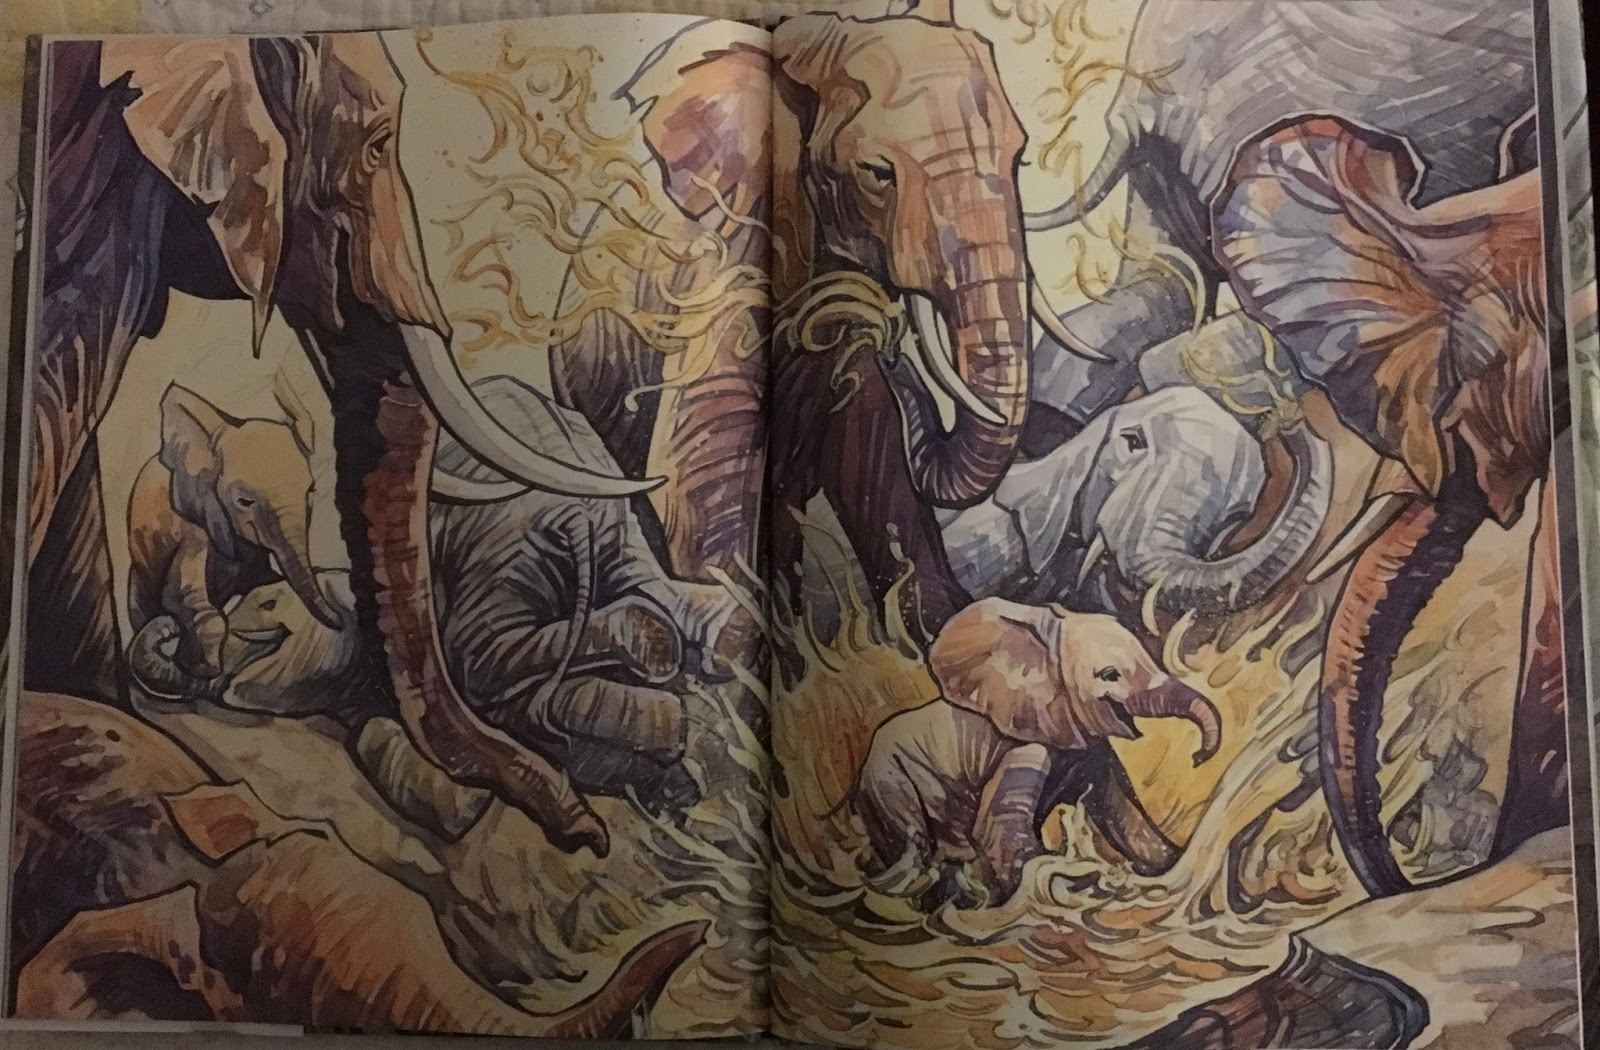 teacherdance two amazing books about animals